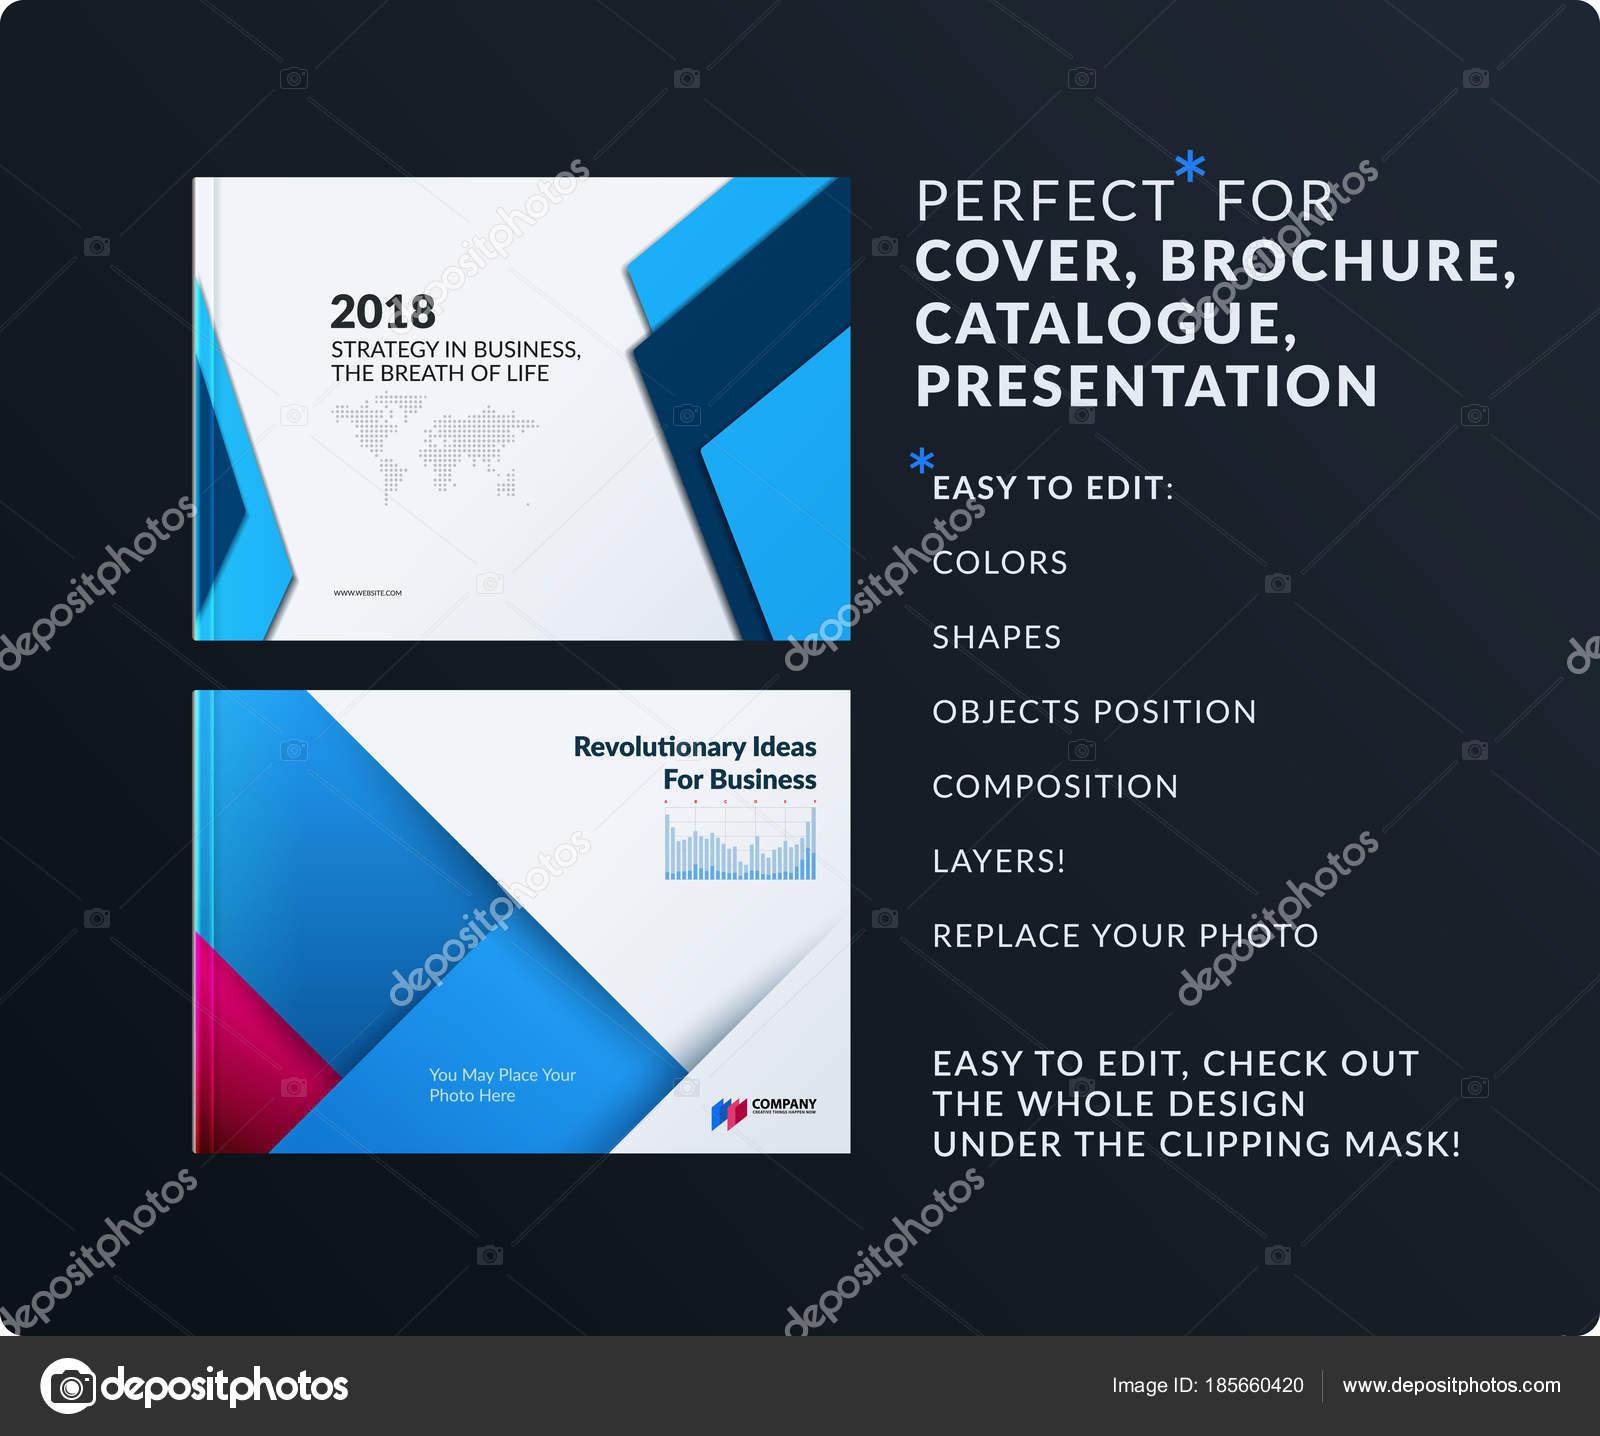 Conception Materielle De Brochure Definie Resume Rapport Annuel La